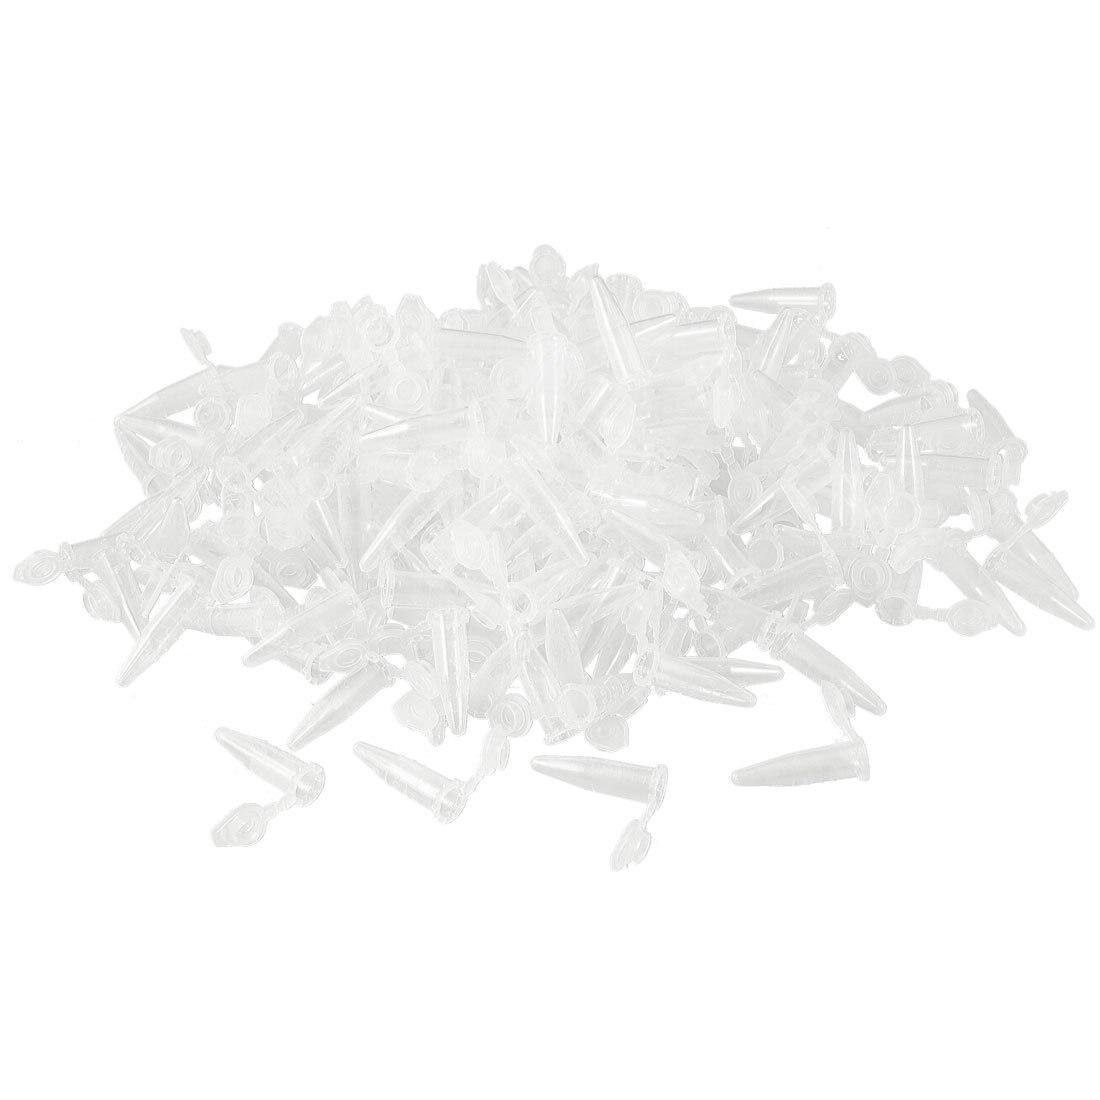 SOSW-1000 Pcs Laboratory Clear White Mark Printed Plastic Centrifuge Tube 0.5ml